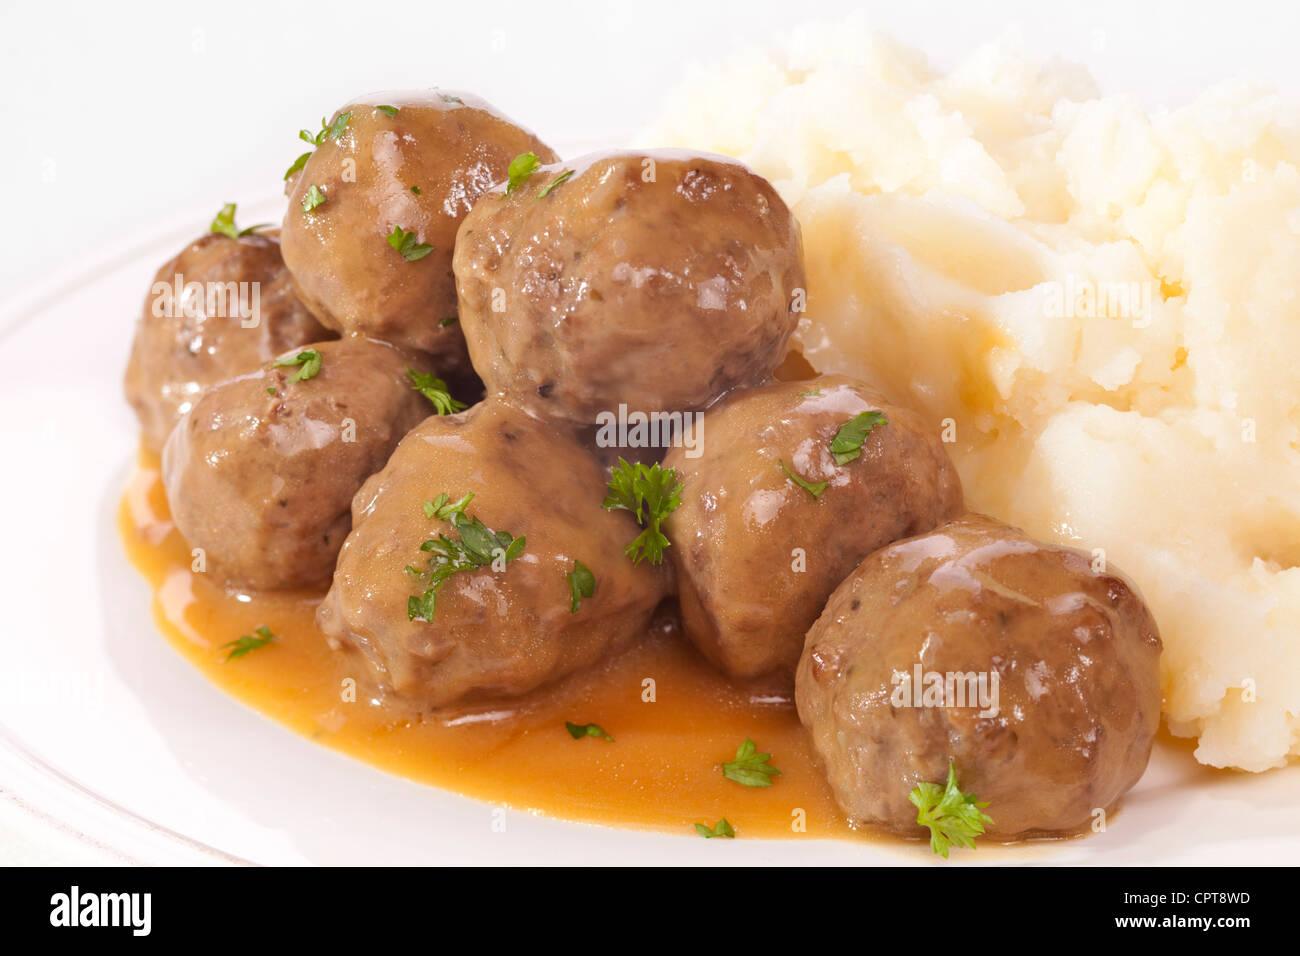 Swedish Meatballs And Mashed Potatoes